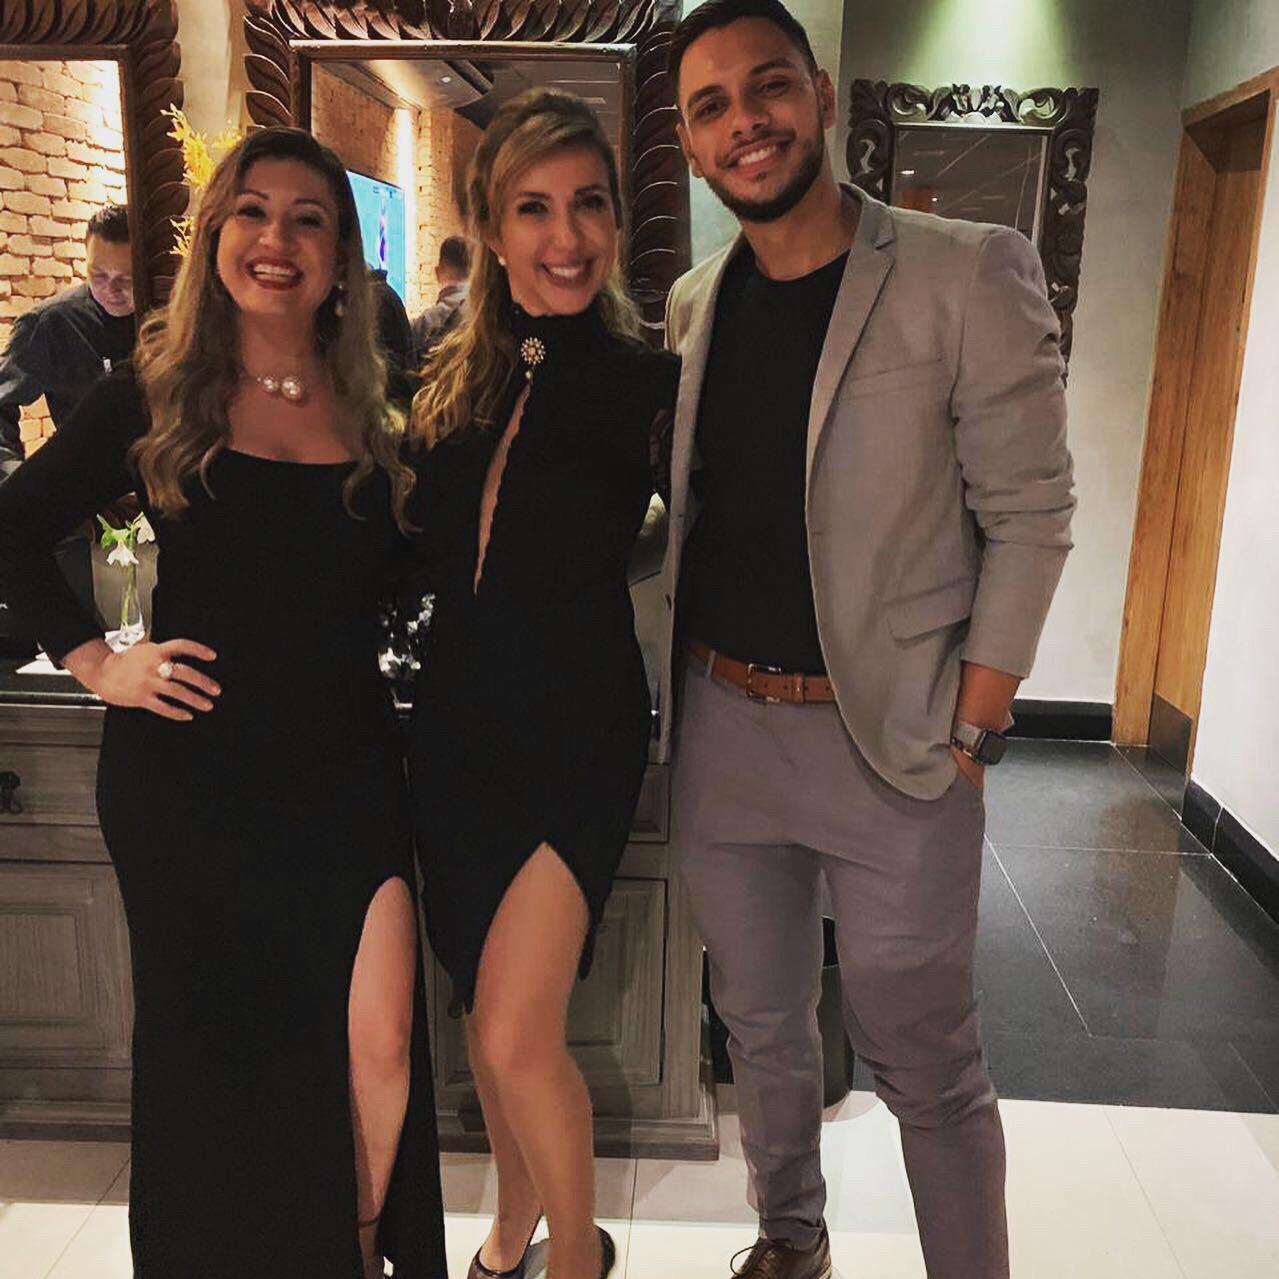 Cynara Leão Personal &STETIC volta a ser premiada em São Paulo